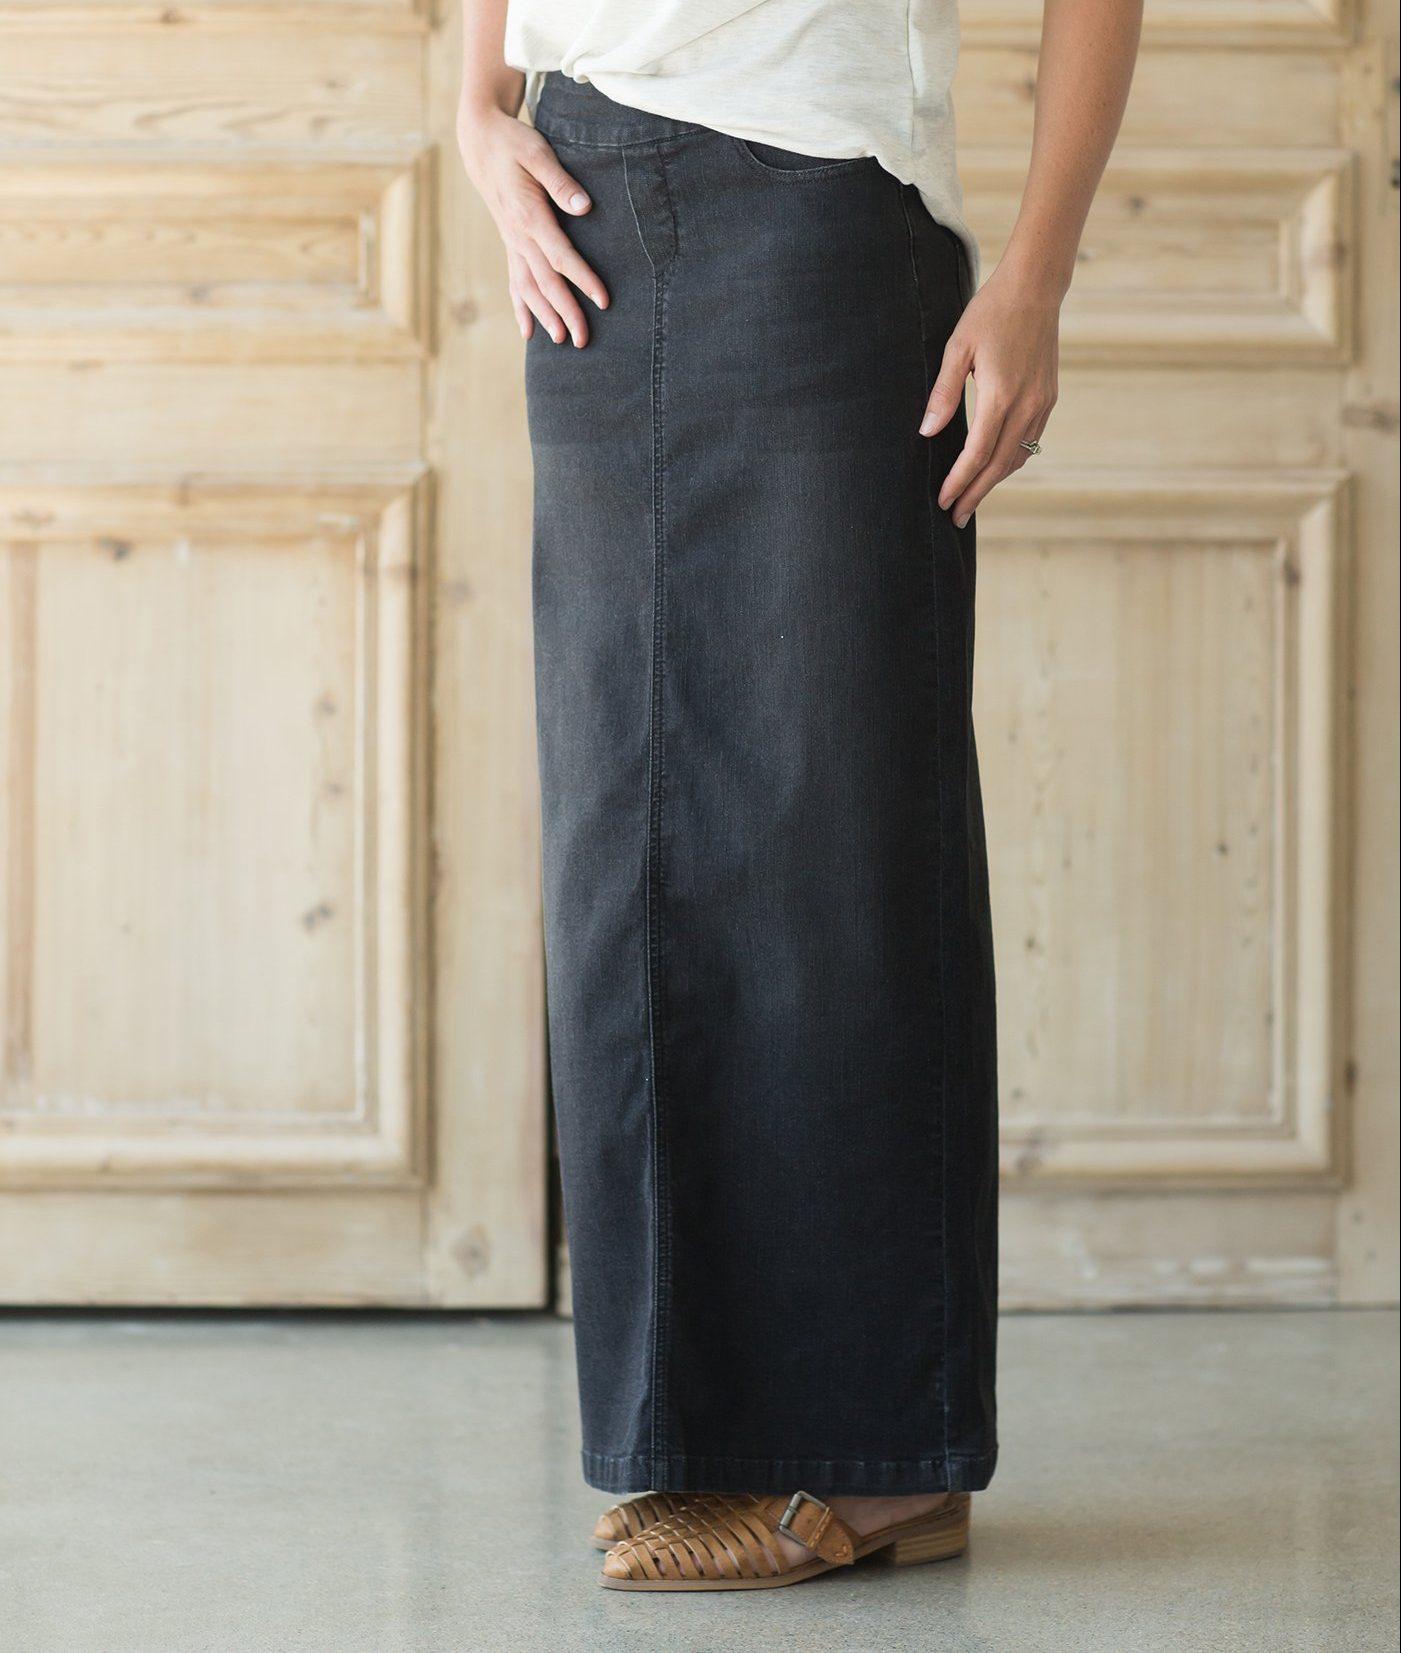 64a3c8ce Donna Denim Skirt – Designed by Inherit, this full-length denim skirt fets  a modest update from dark heathered denim look, streamlined elastic  waistband, ...